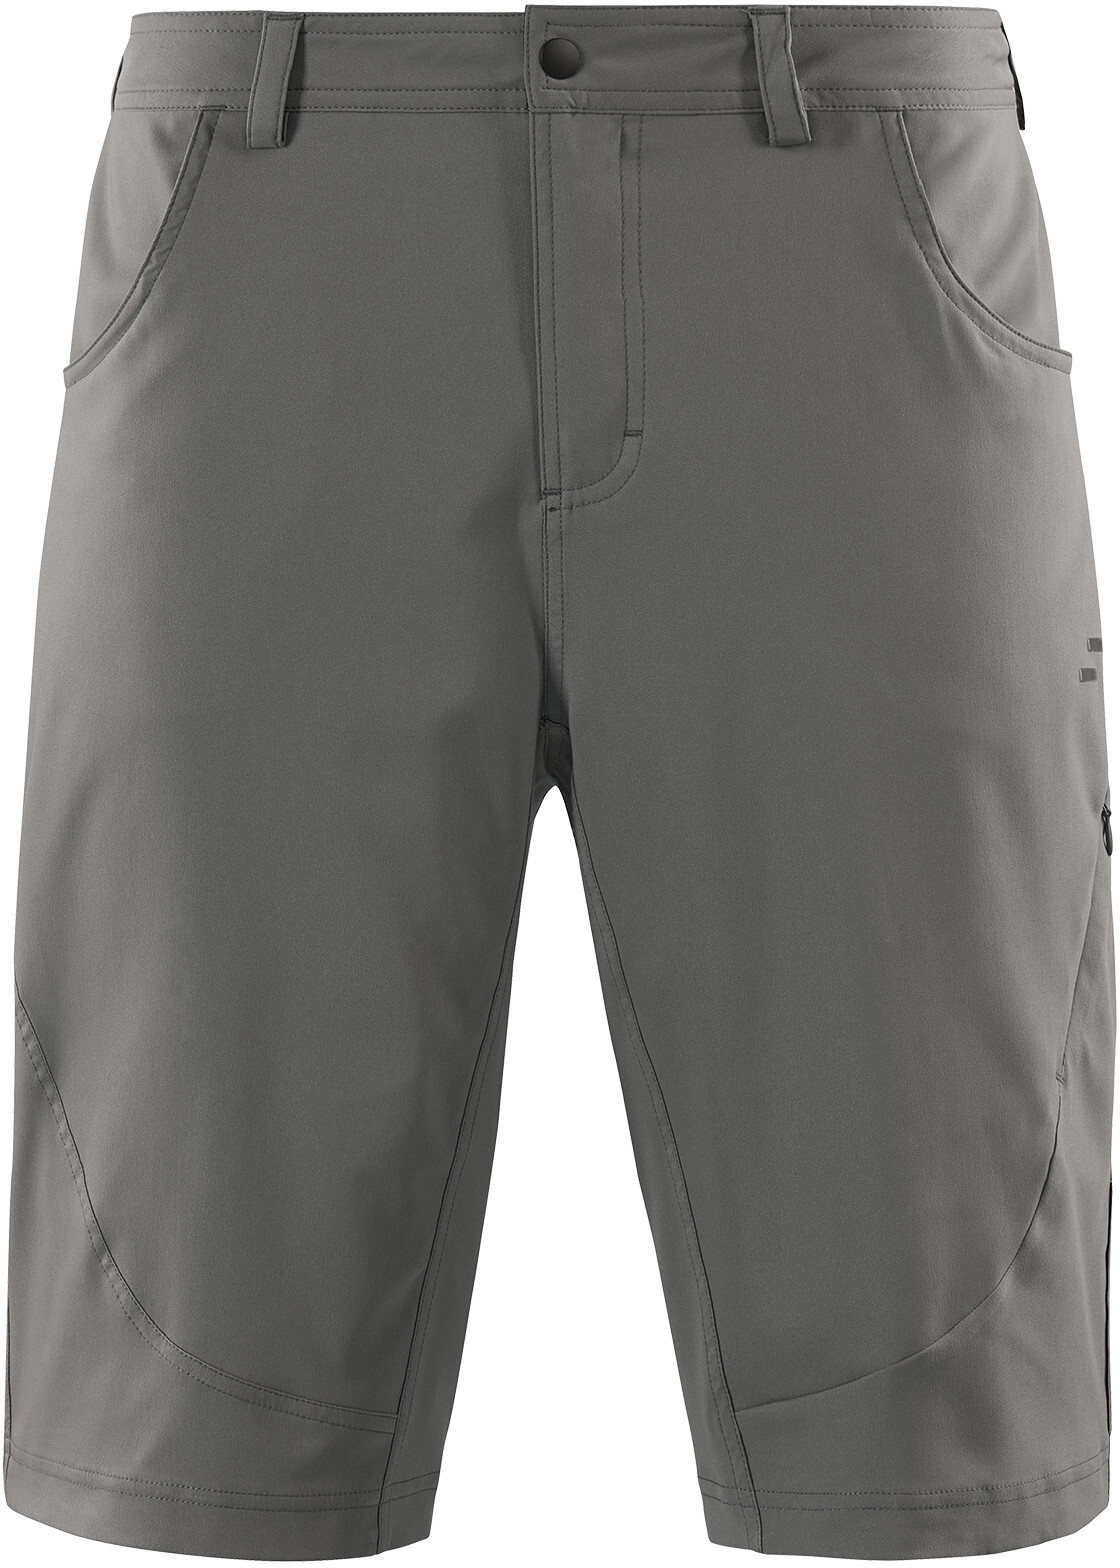 SQUARE Active Cykelbukser inkl. Inderbukser Herrer, grey (2020) | Trousers